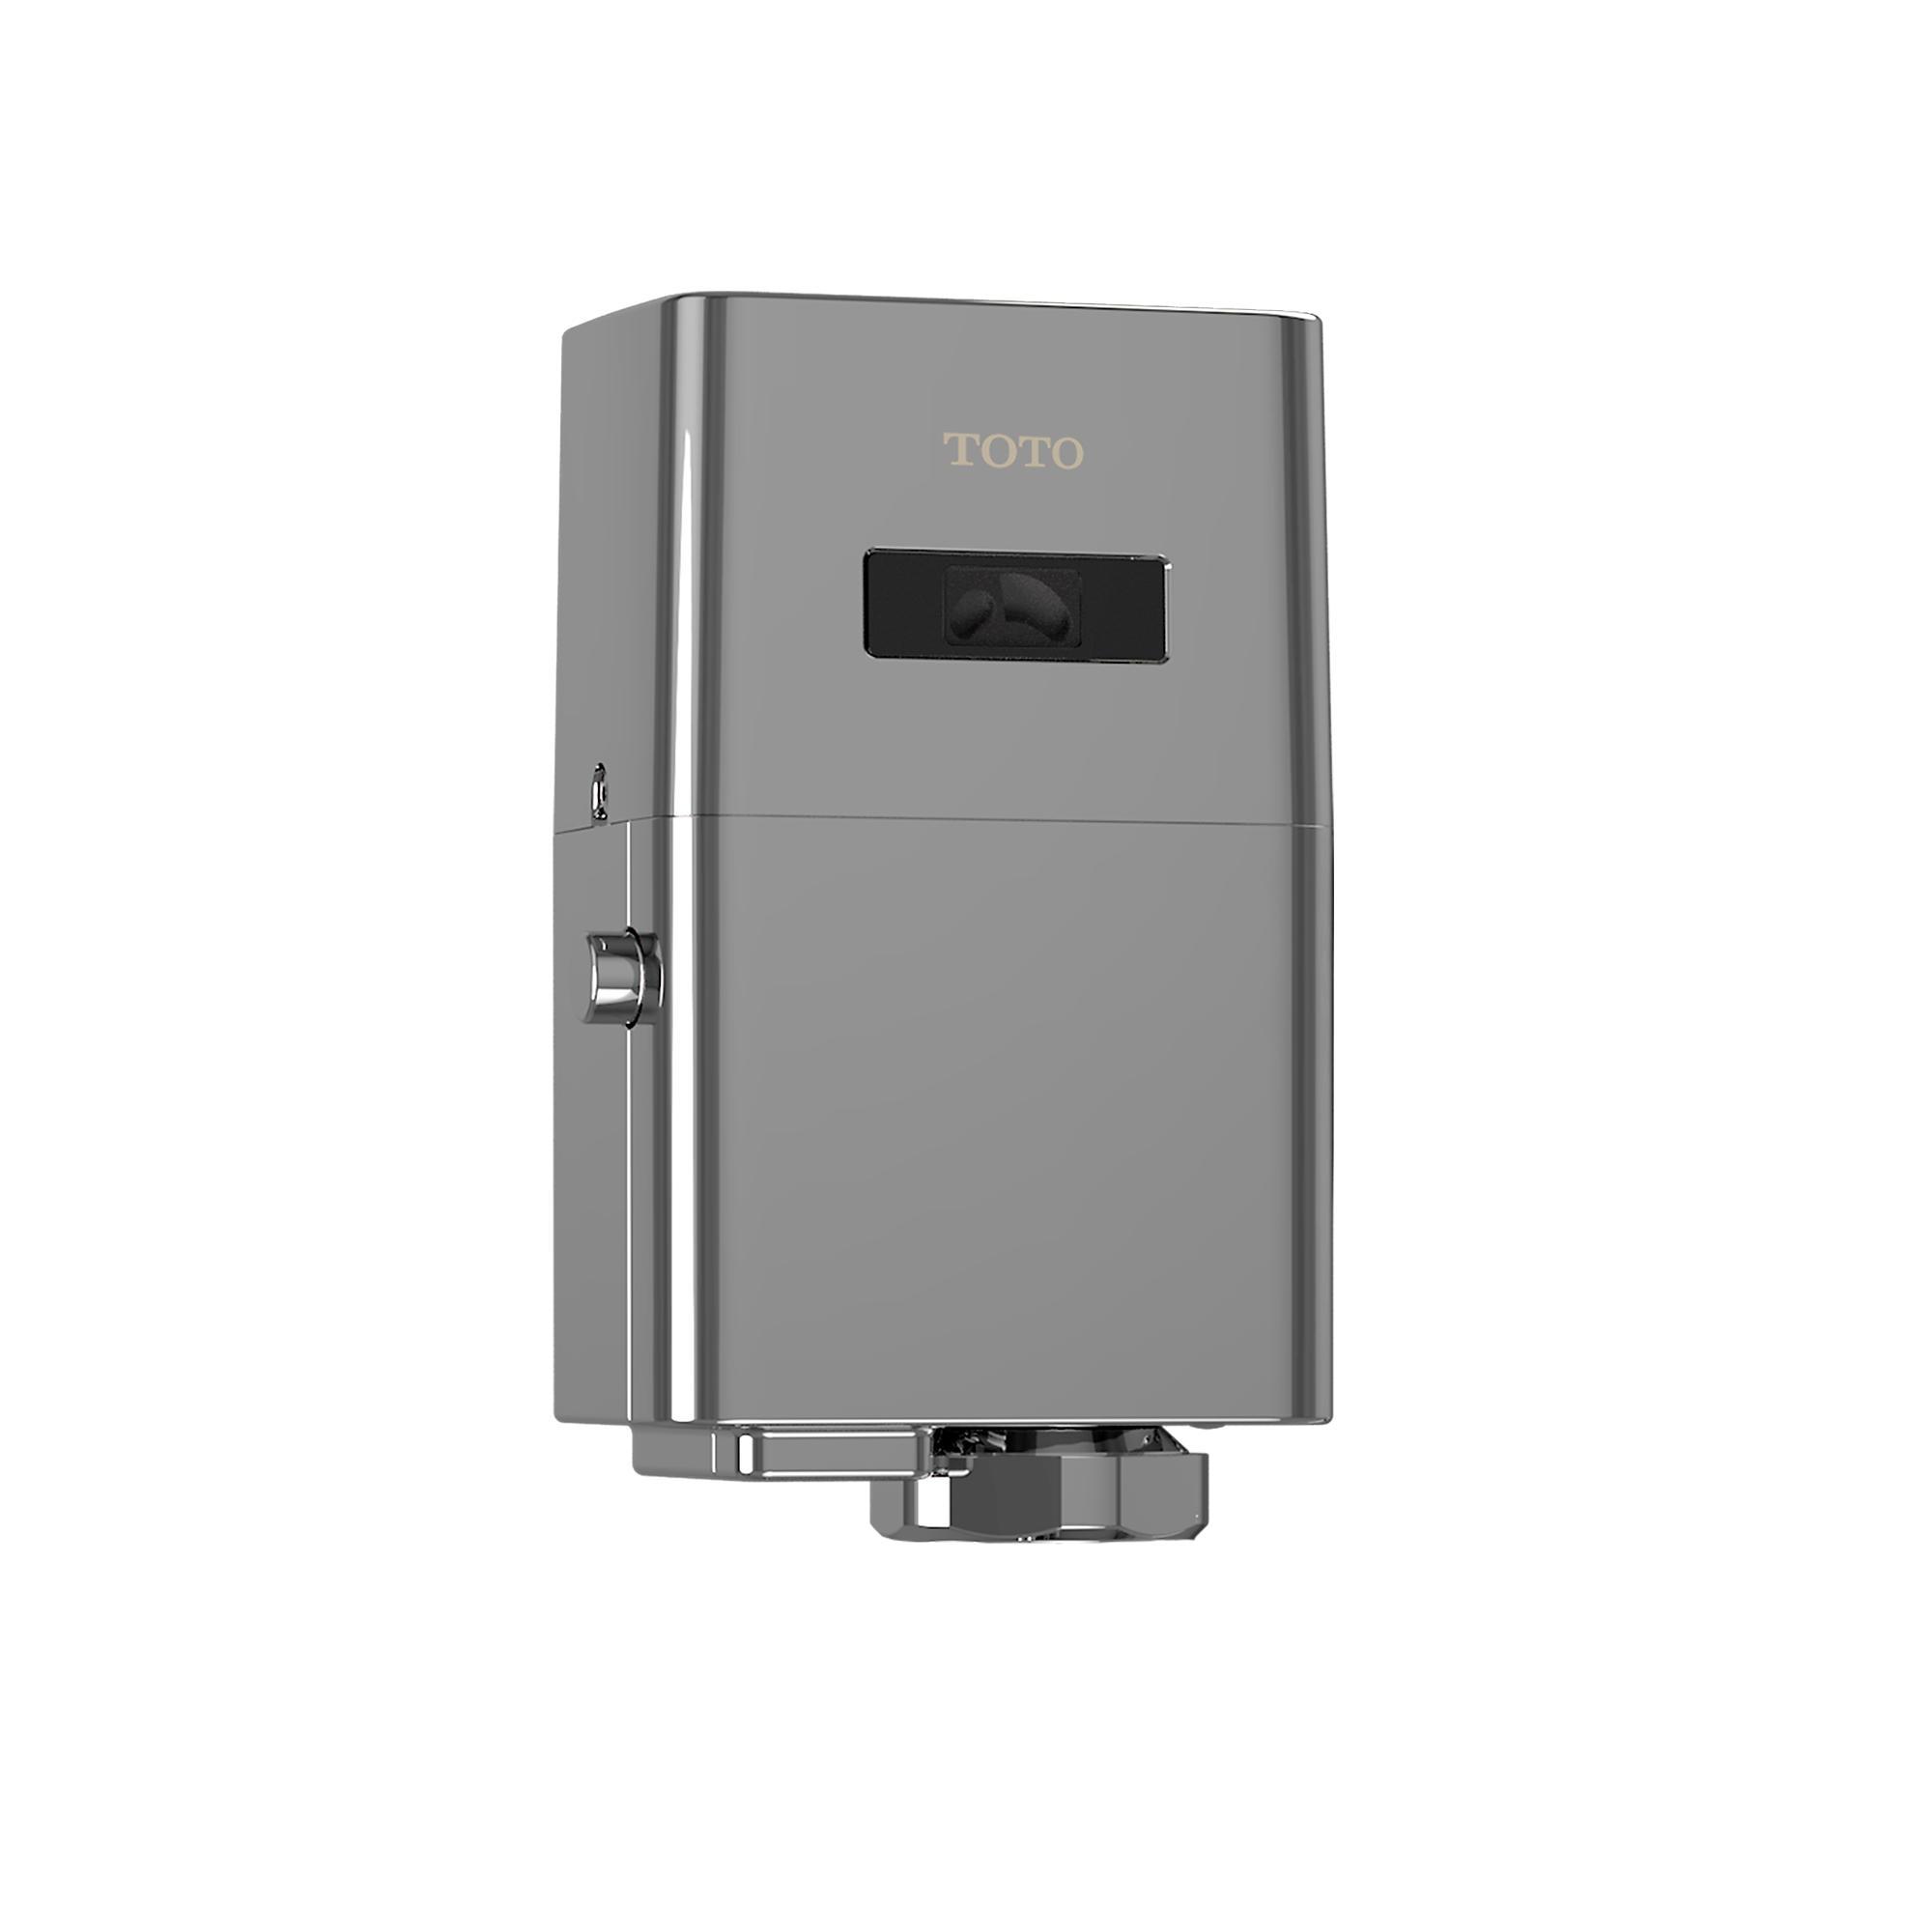 Tet6ga cp ecopower  toilet flush valve only   1 6 gpf 0